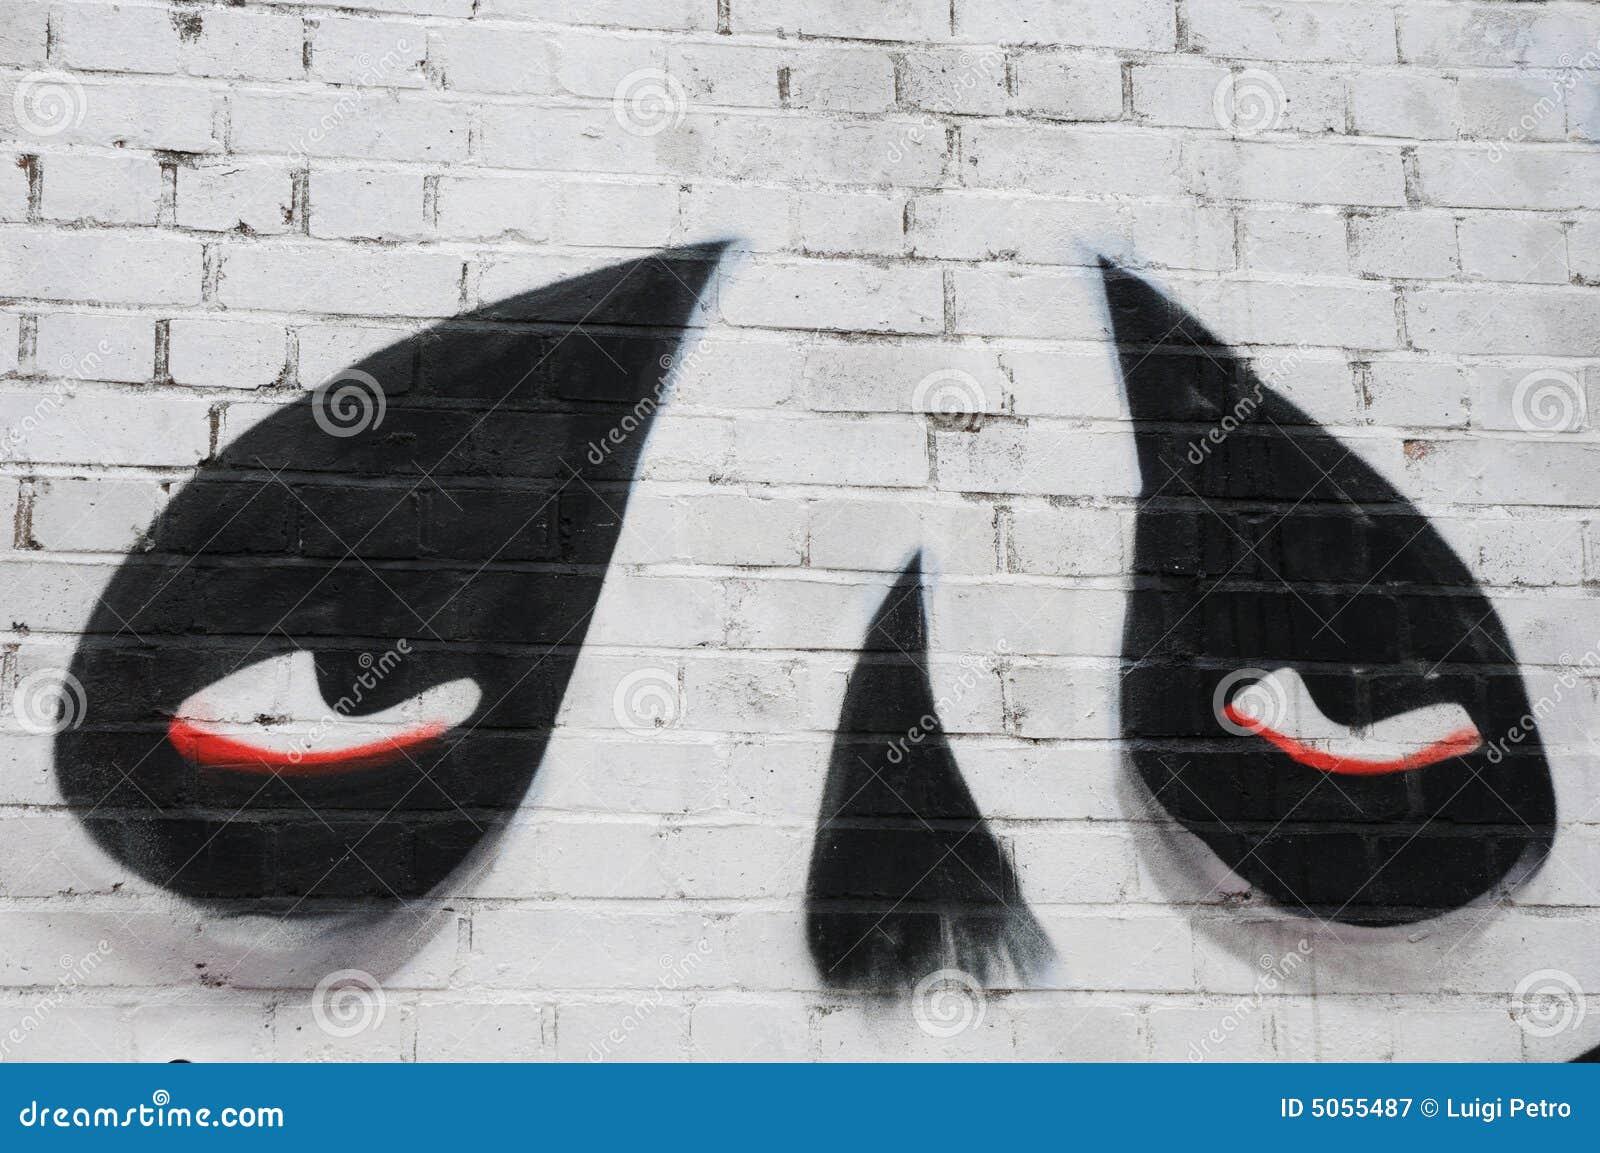 London sclater graffiti street